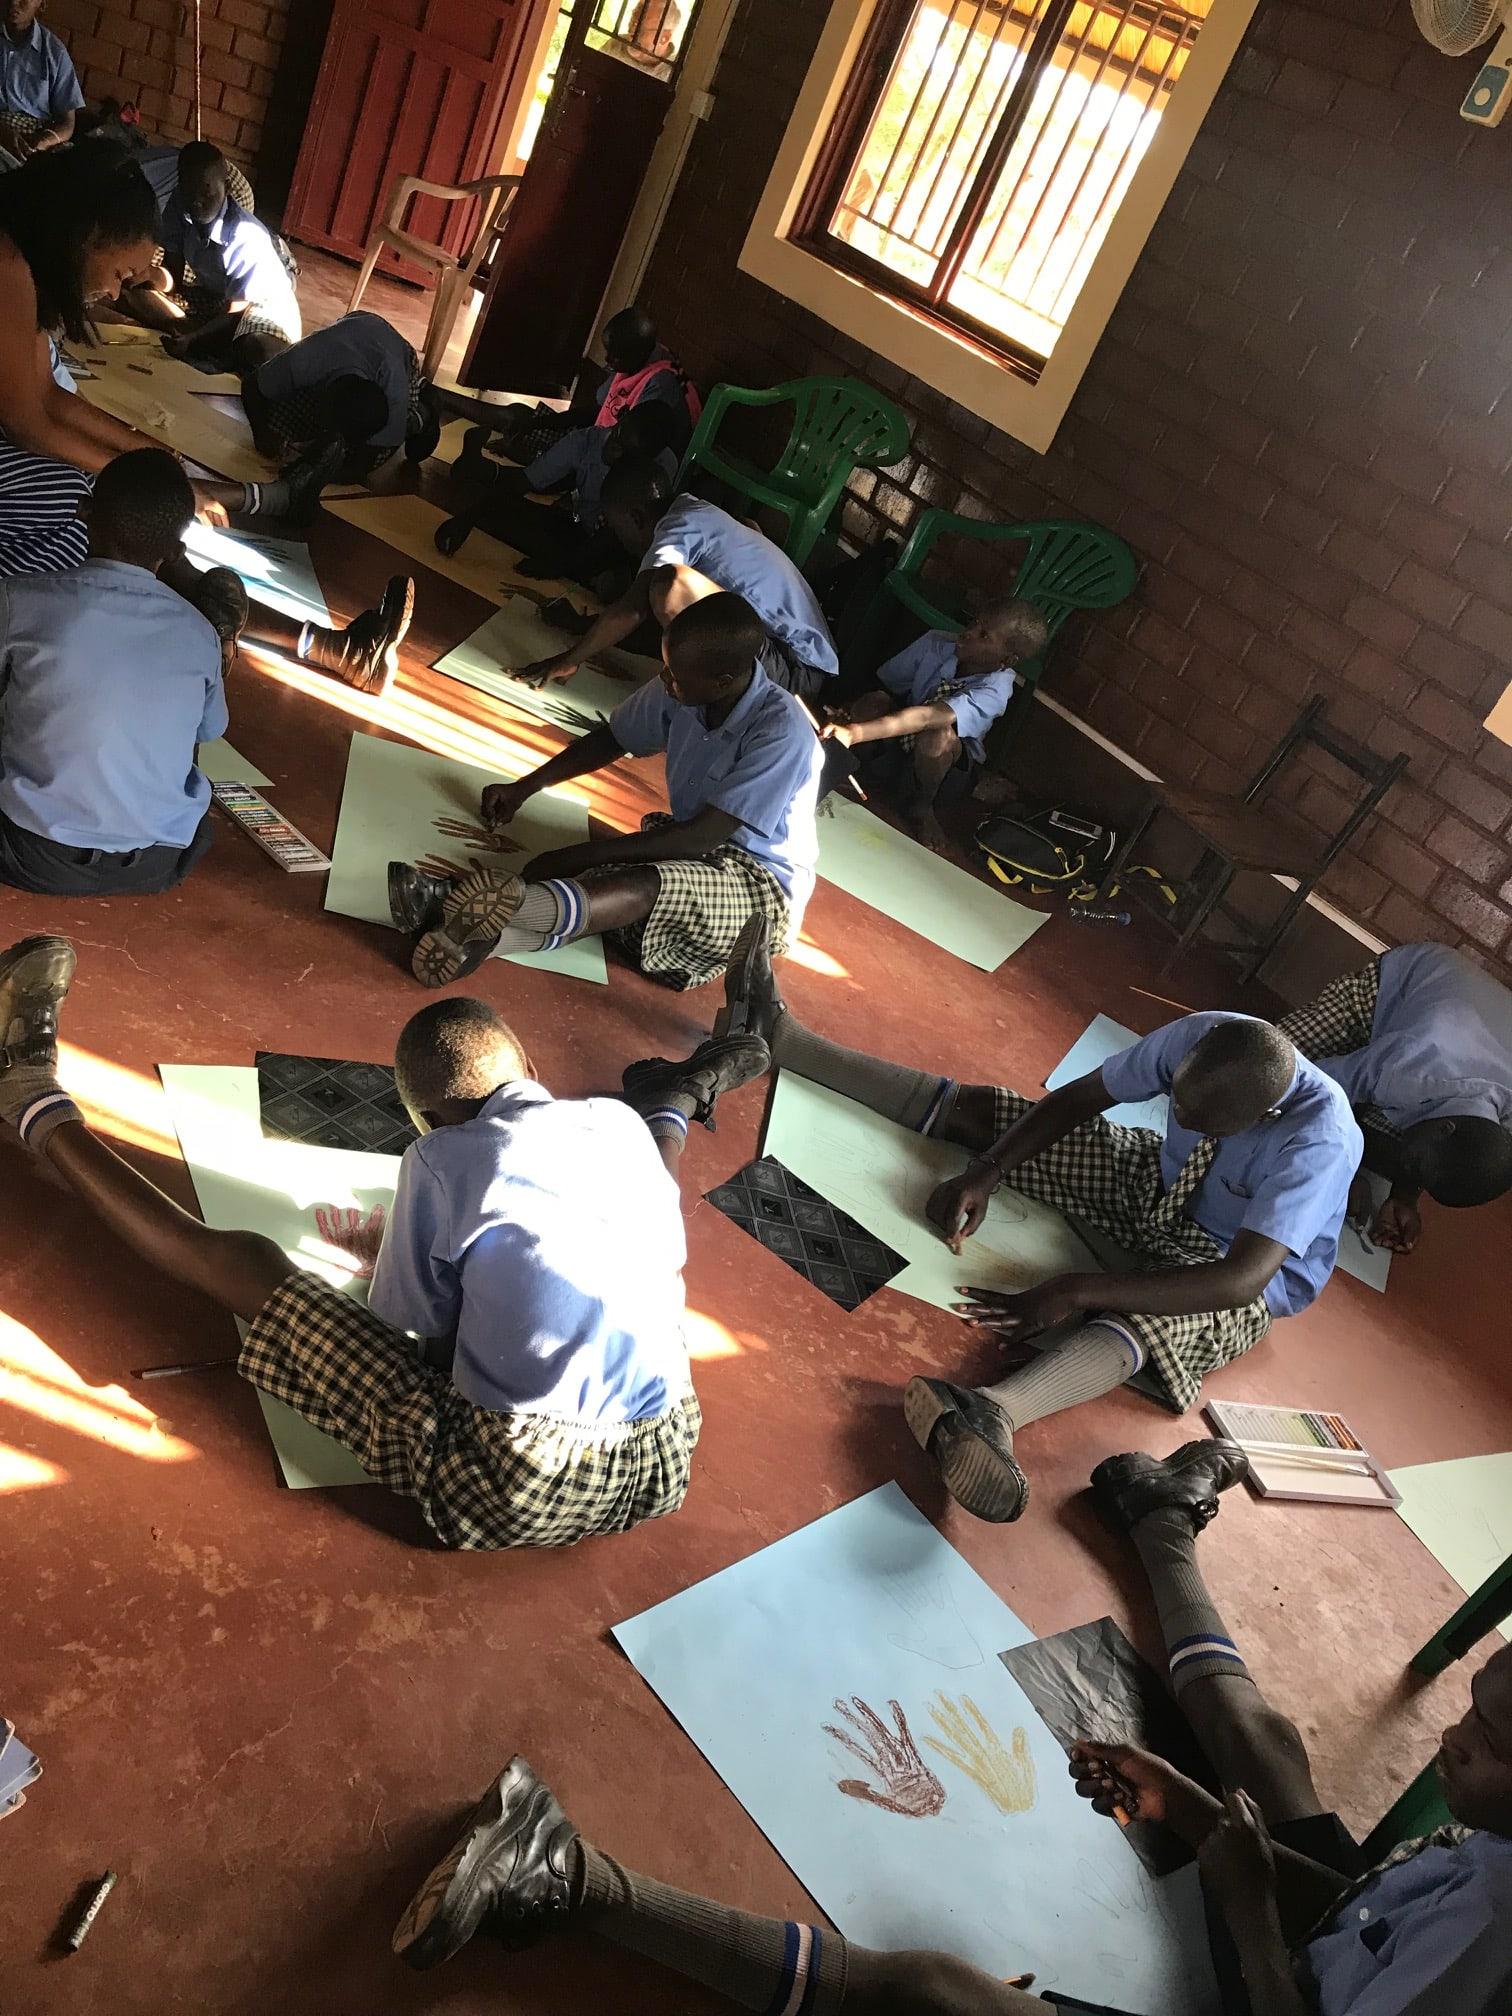 Men sitting on floor drawing